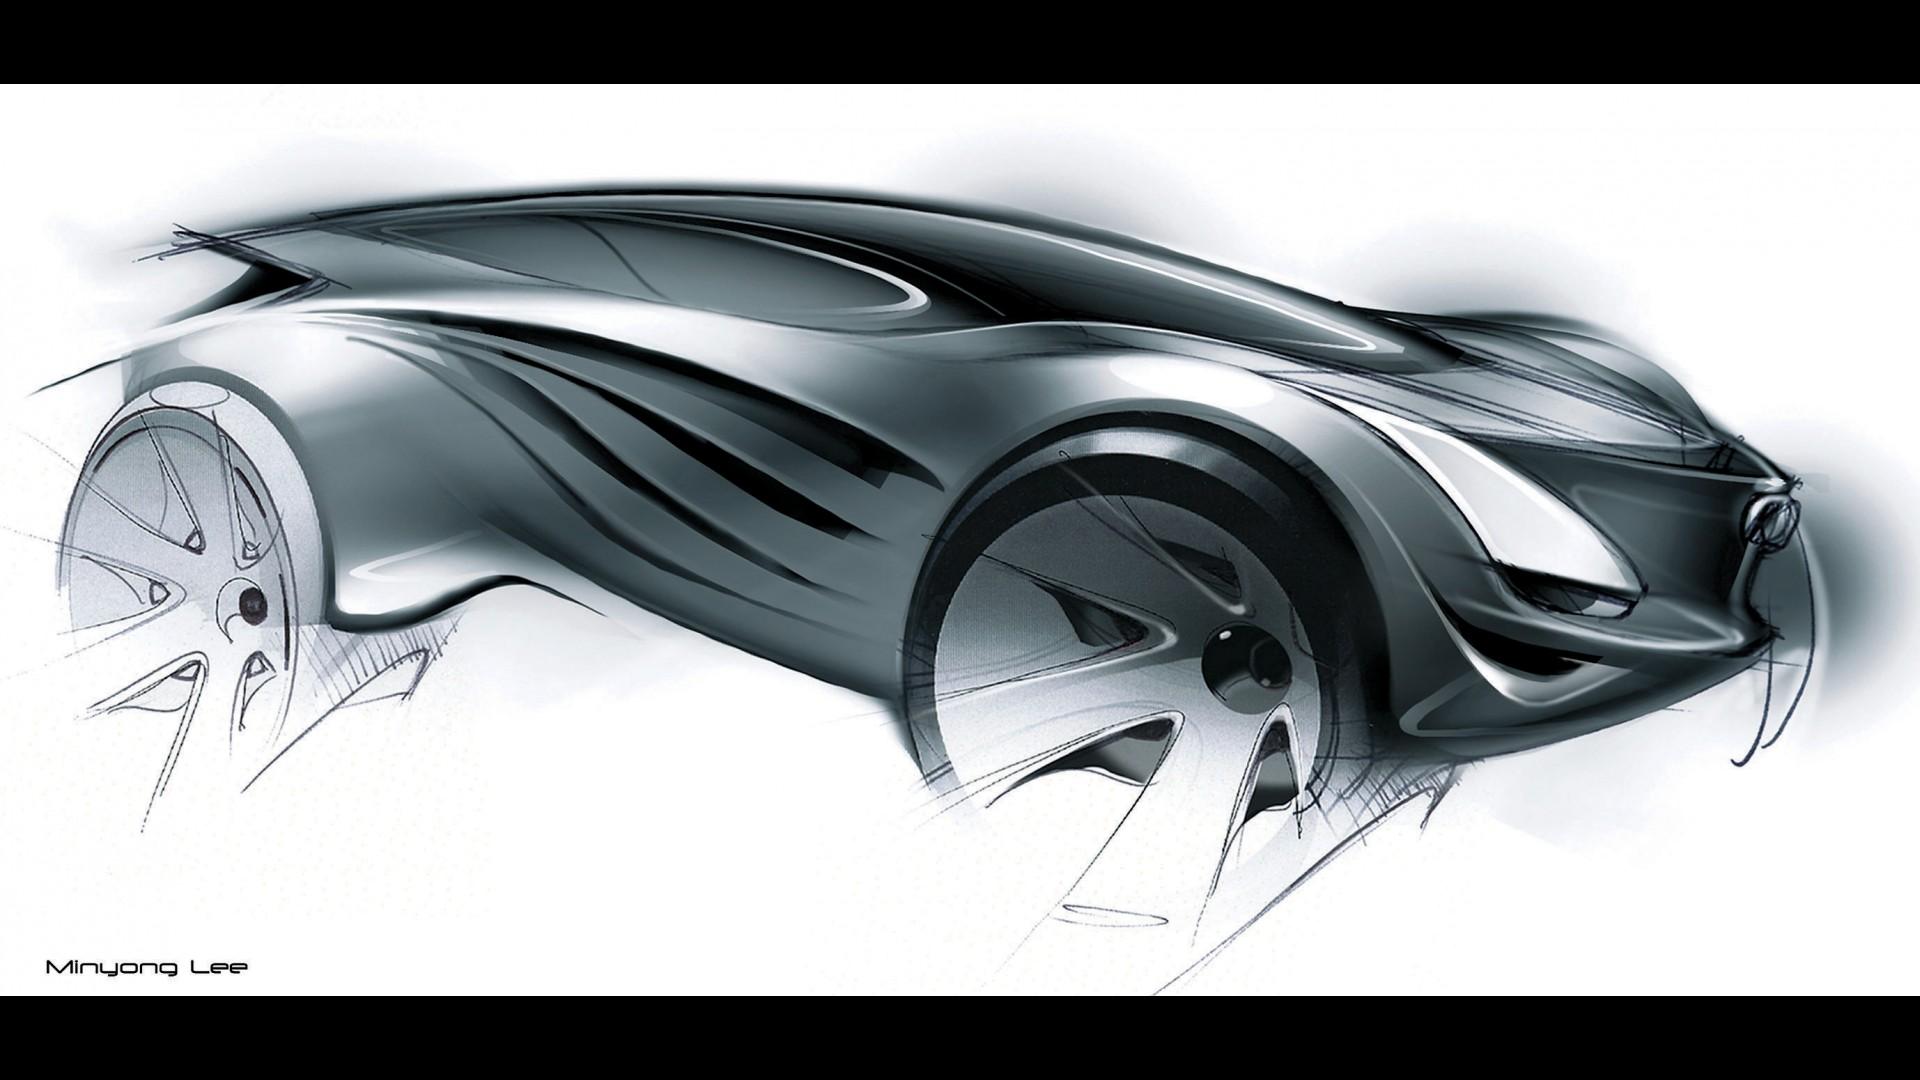 https://icdn-8.motor1.com/images/mgl/y7l1k/s1/mazda-kazamai-concept.jpg